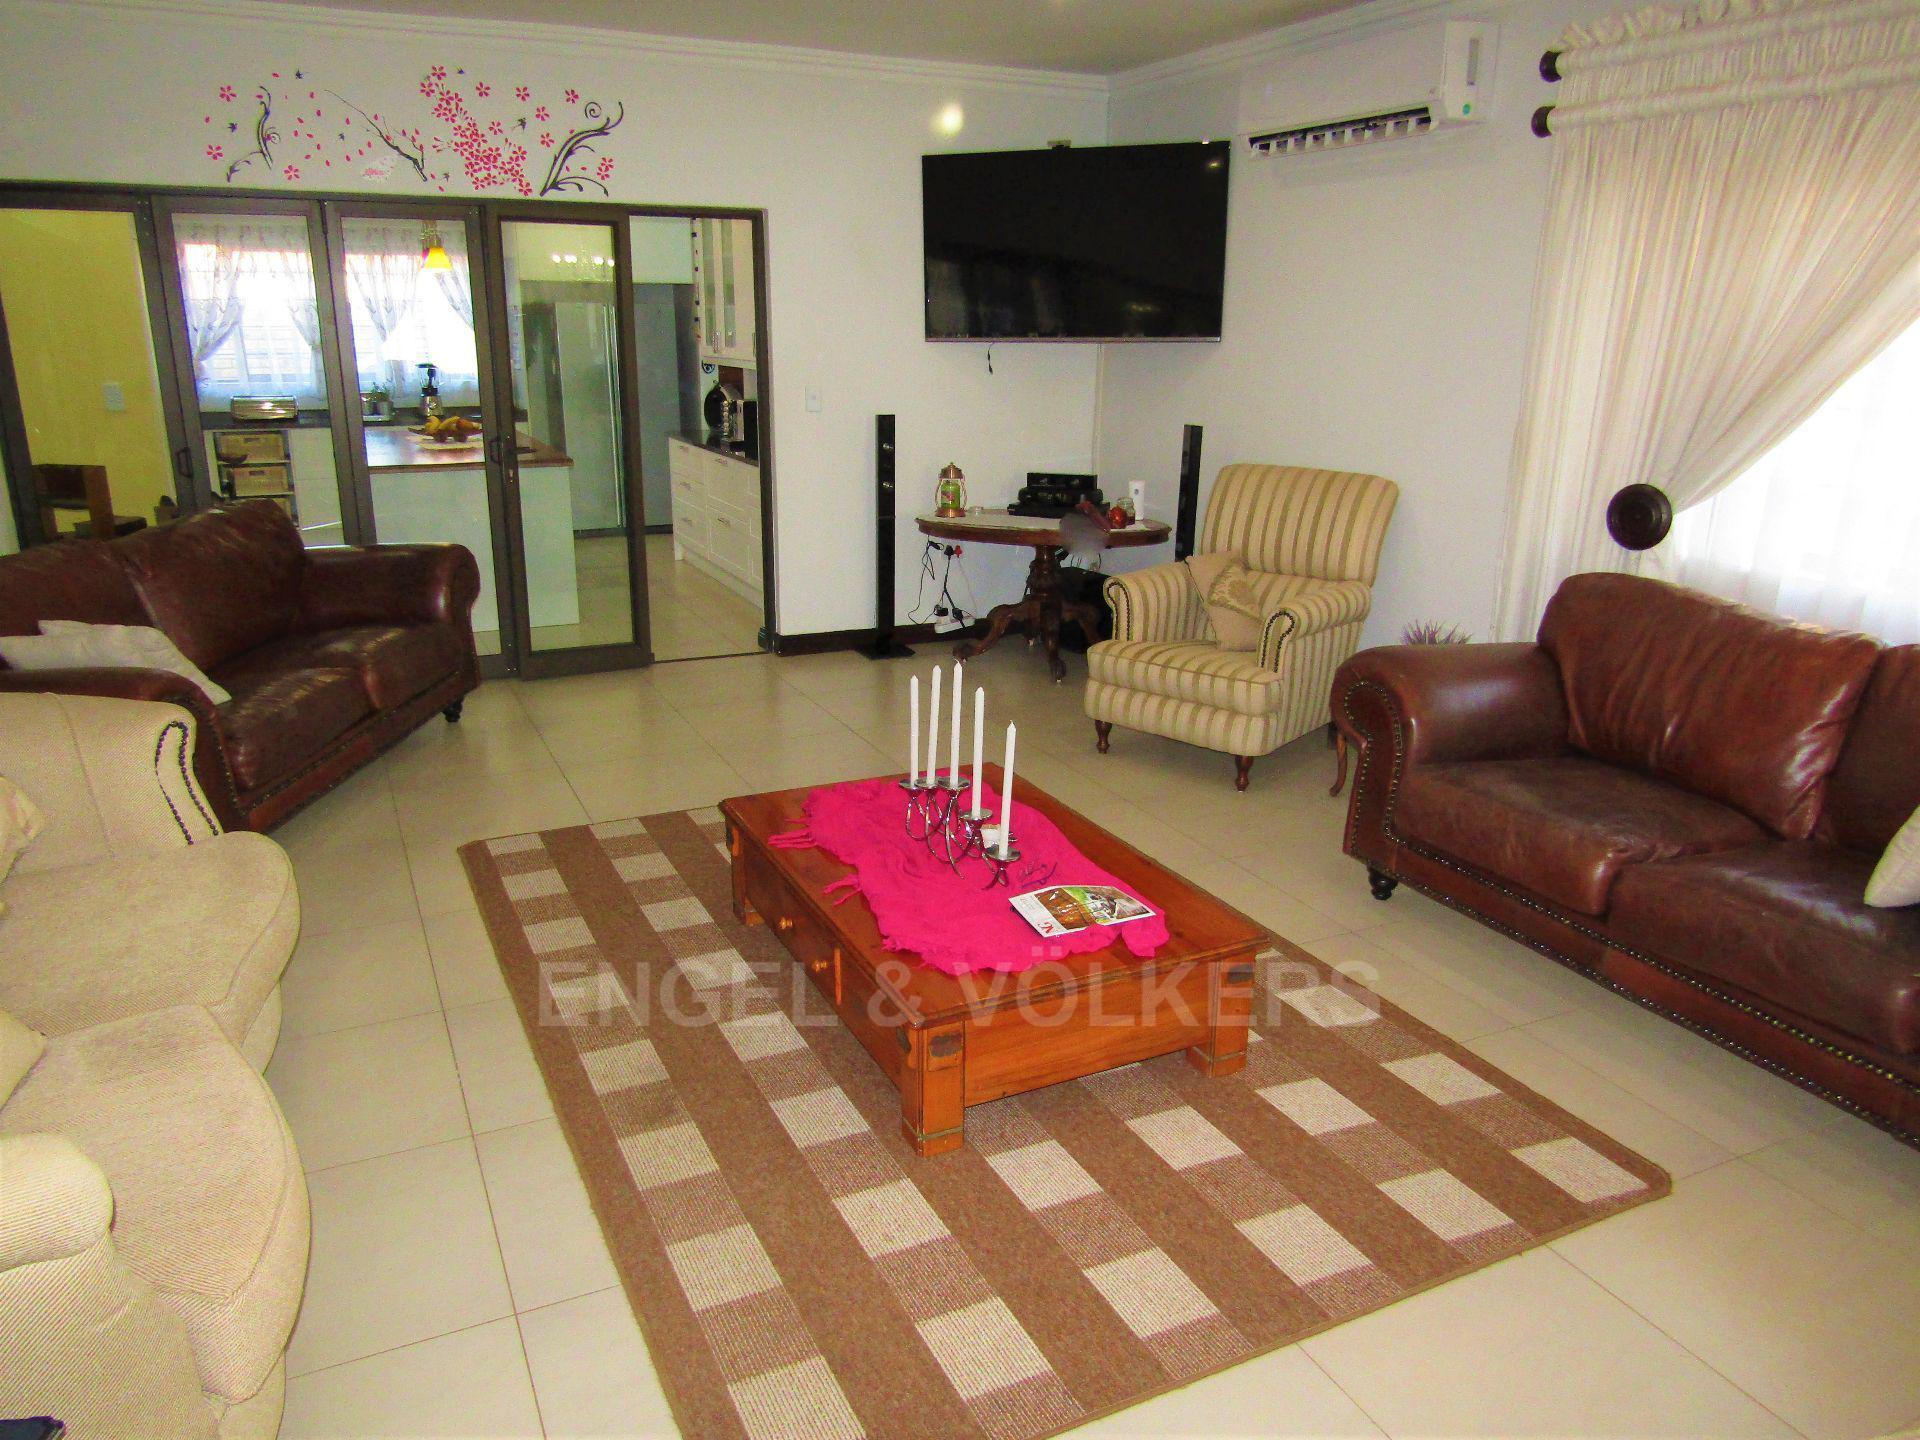 Lifestyle Estate property for sale. Ref No: 13458759. Picture no 3